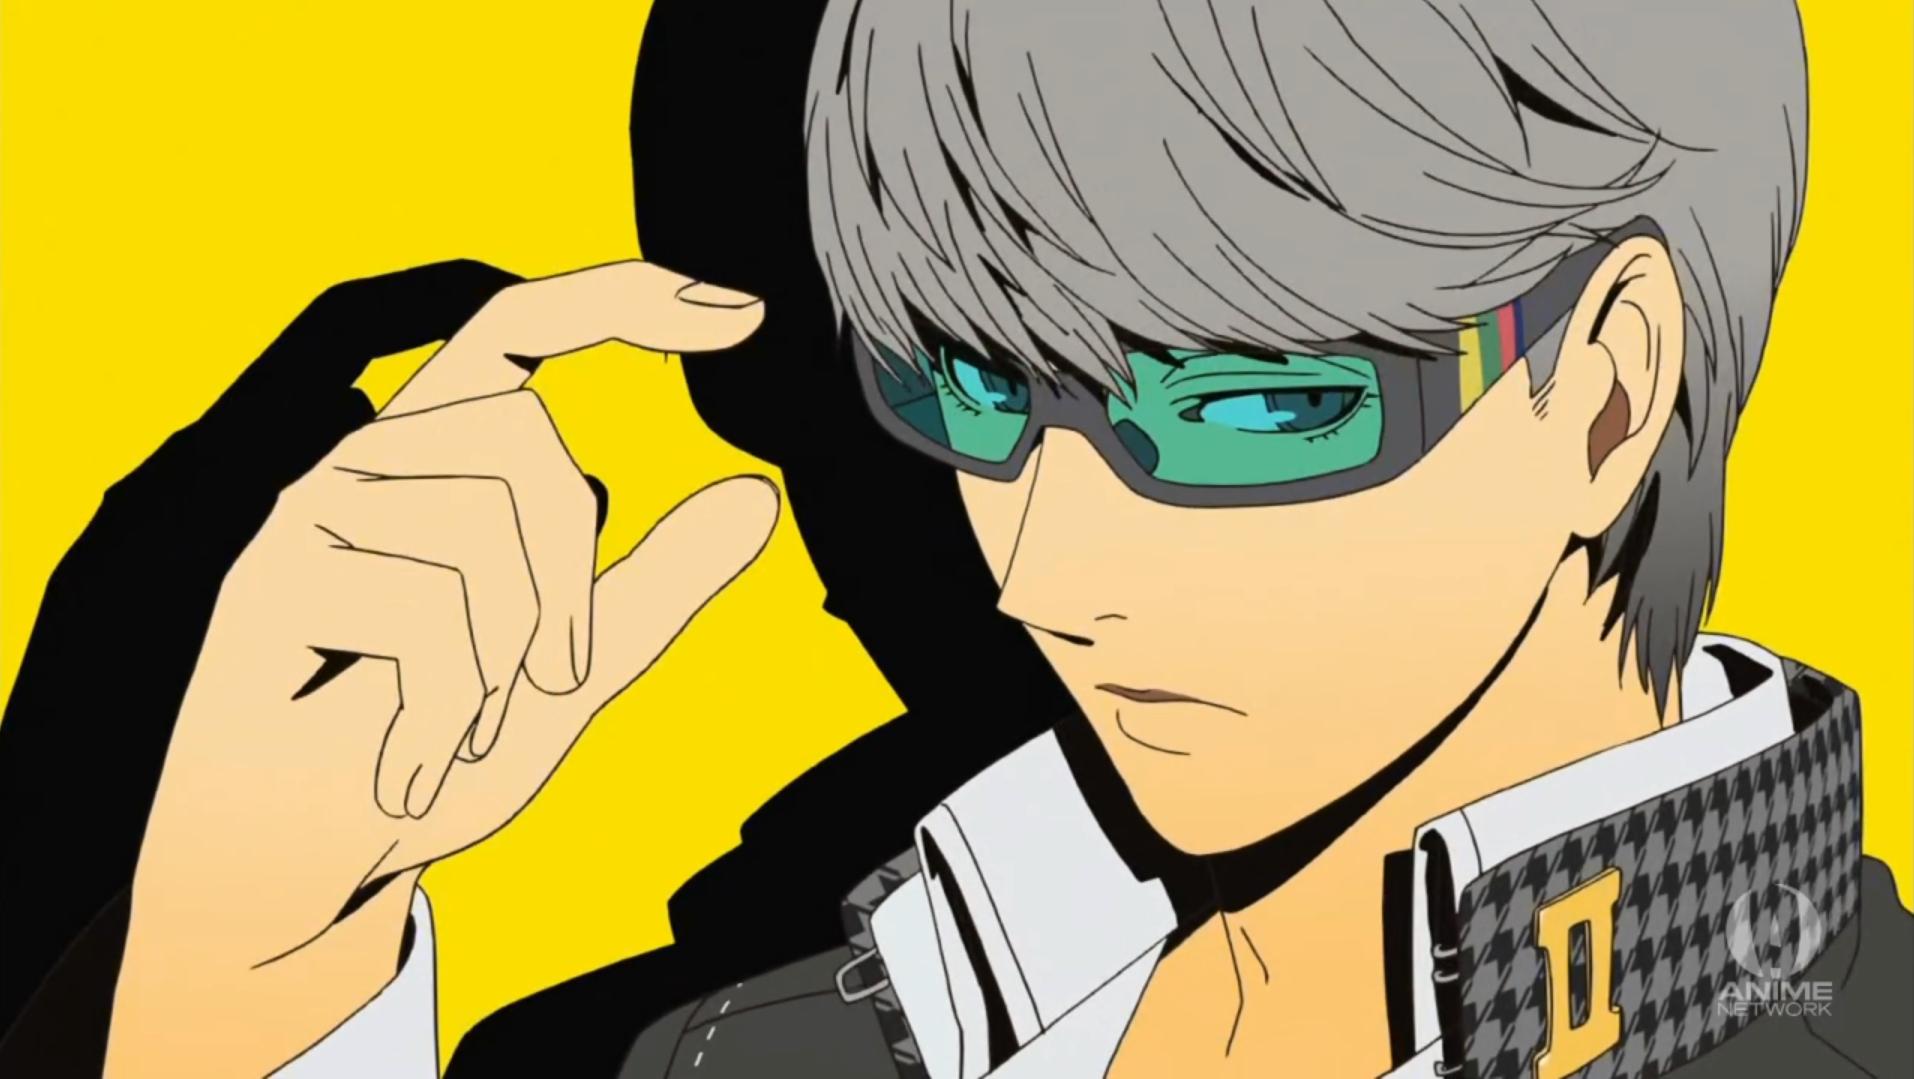 THE OFFICIAL YU NARUKAMI (Persona 4) MOVESET!